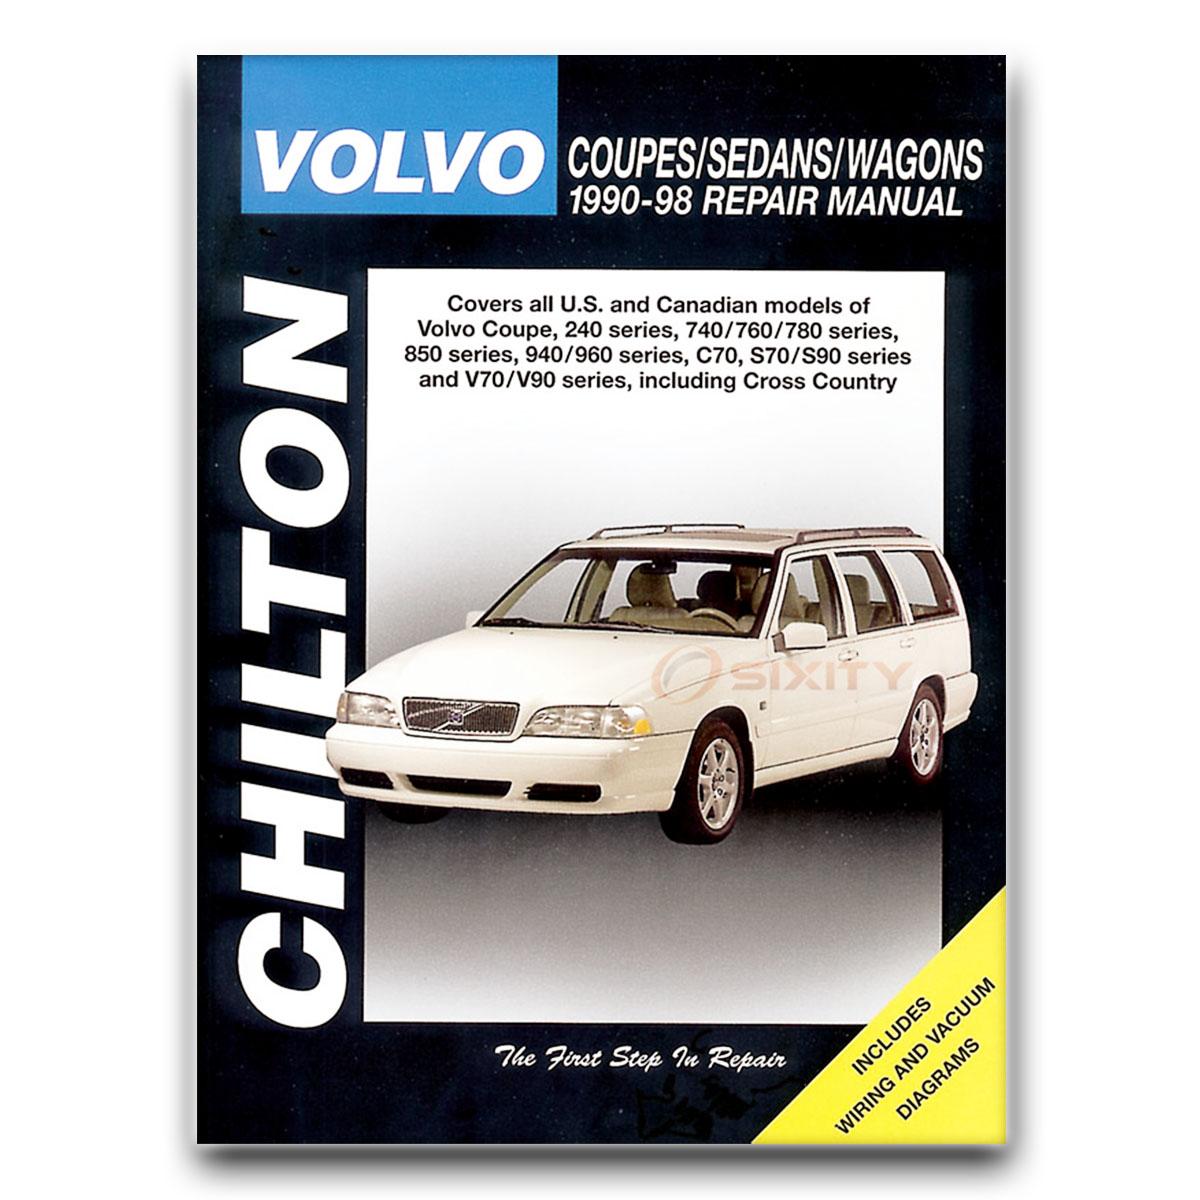 Volvo 760 Chilton Repair Manual Base GLE Shop Service Garage Book nx